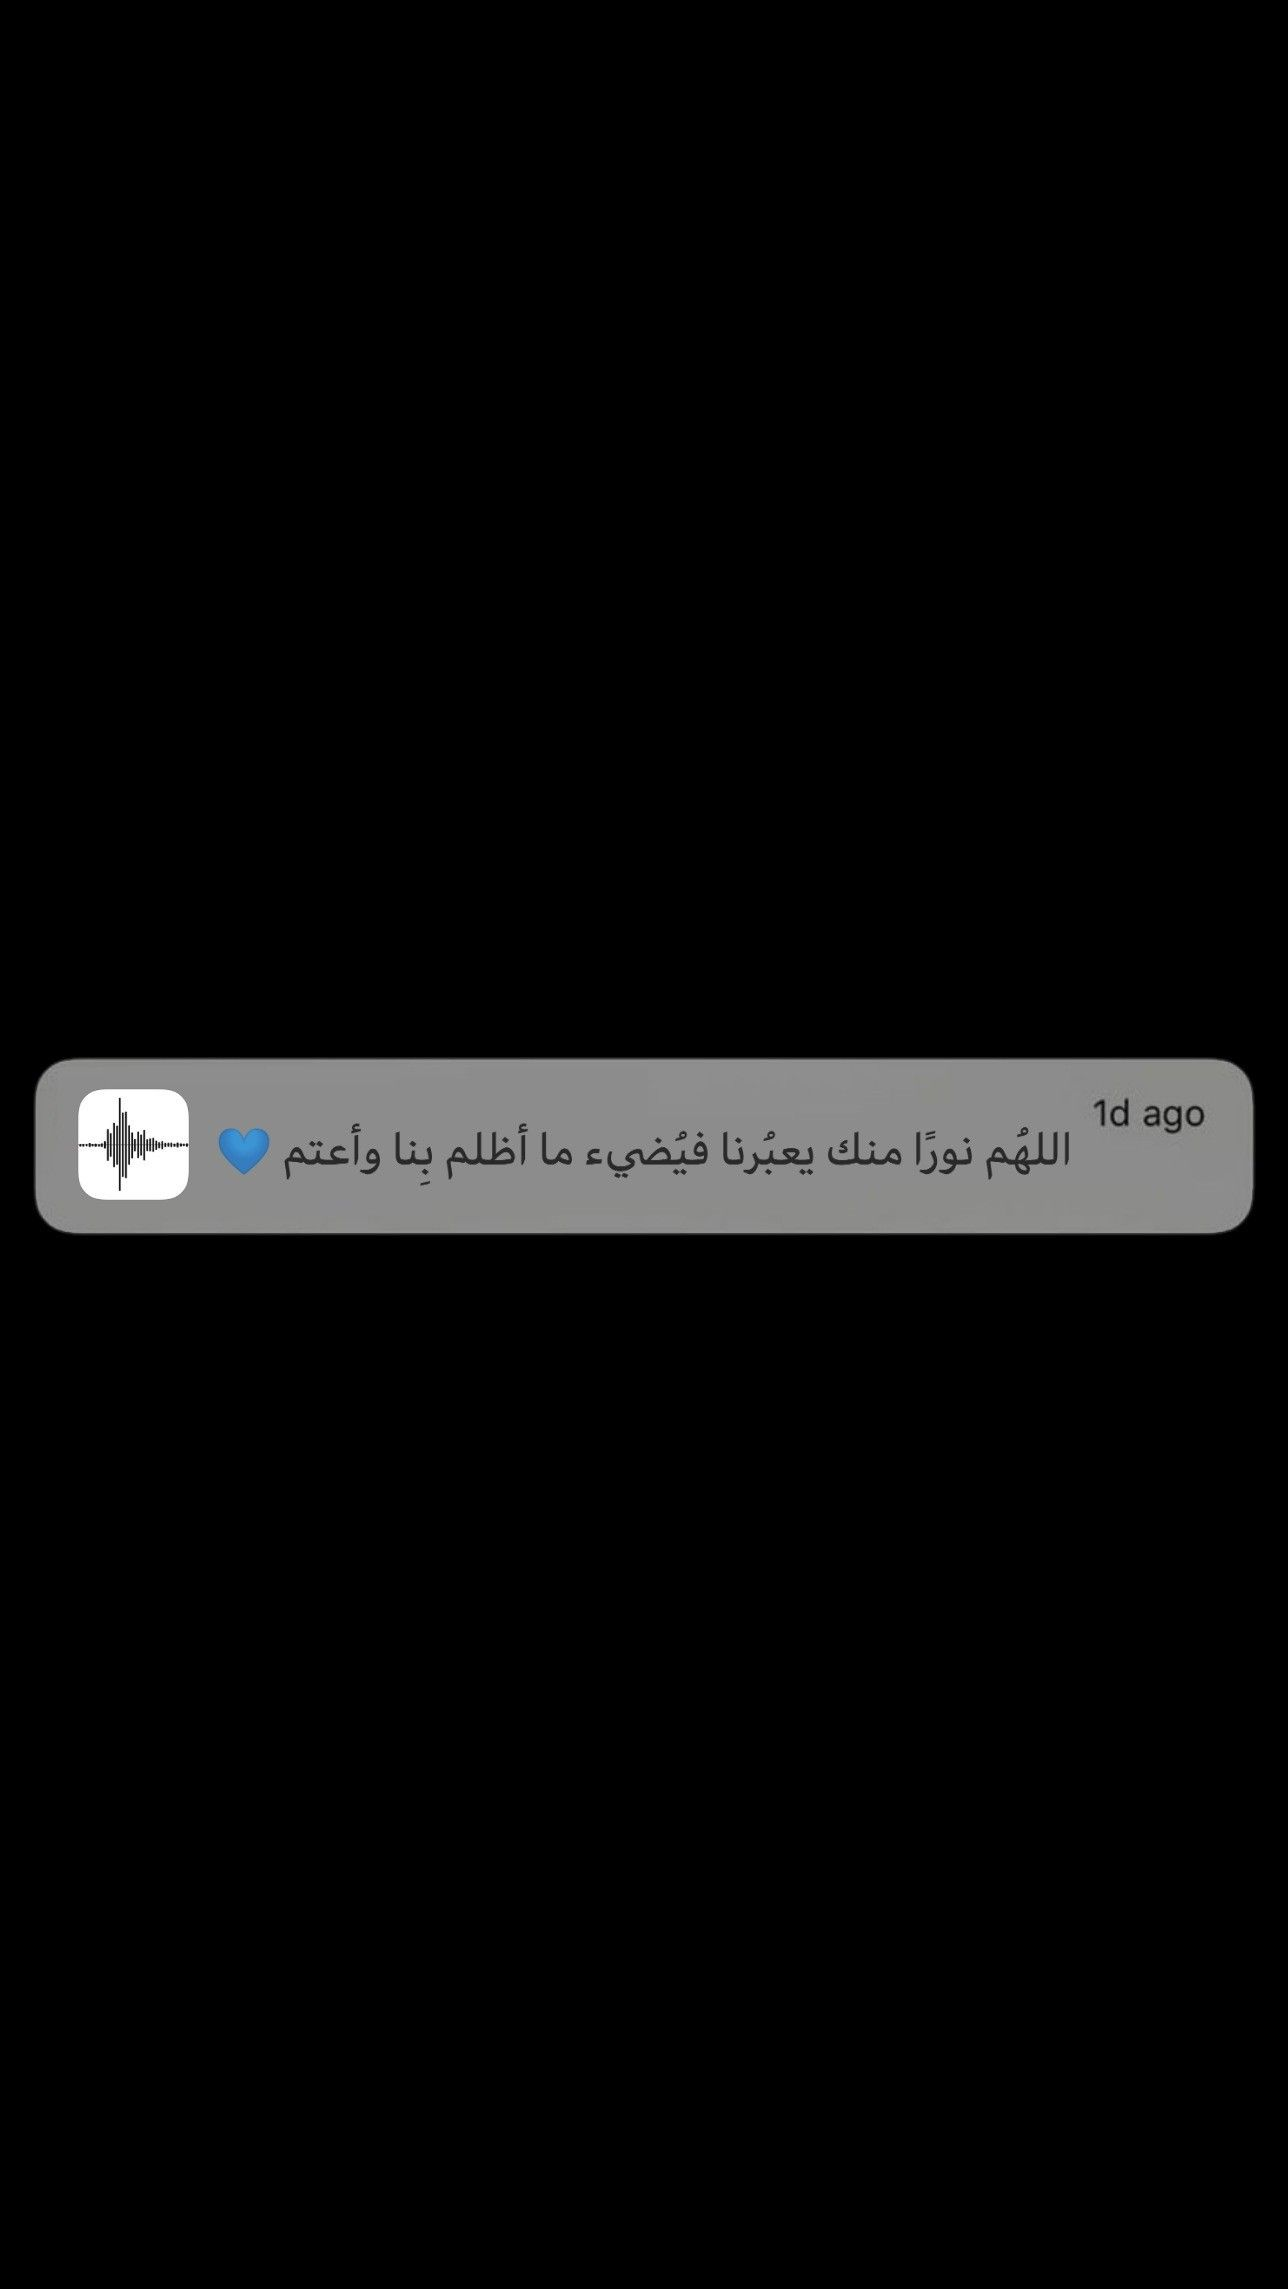 اقتباسات تليجرام تمبلر اقوال انستا خلفيات سوداء بنات افتارات ستوري In 2021 Beautiful Arabic Words Wisdom Quotes Life Cute Quotes